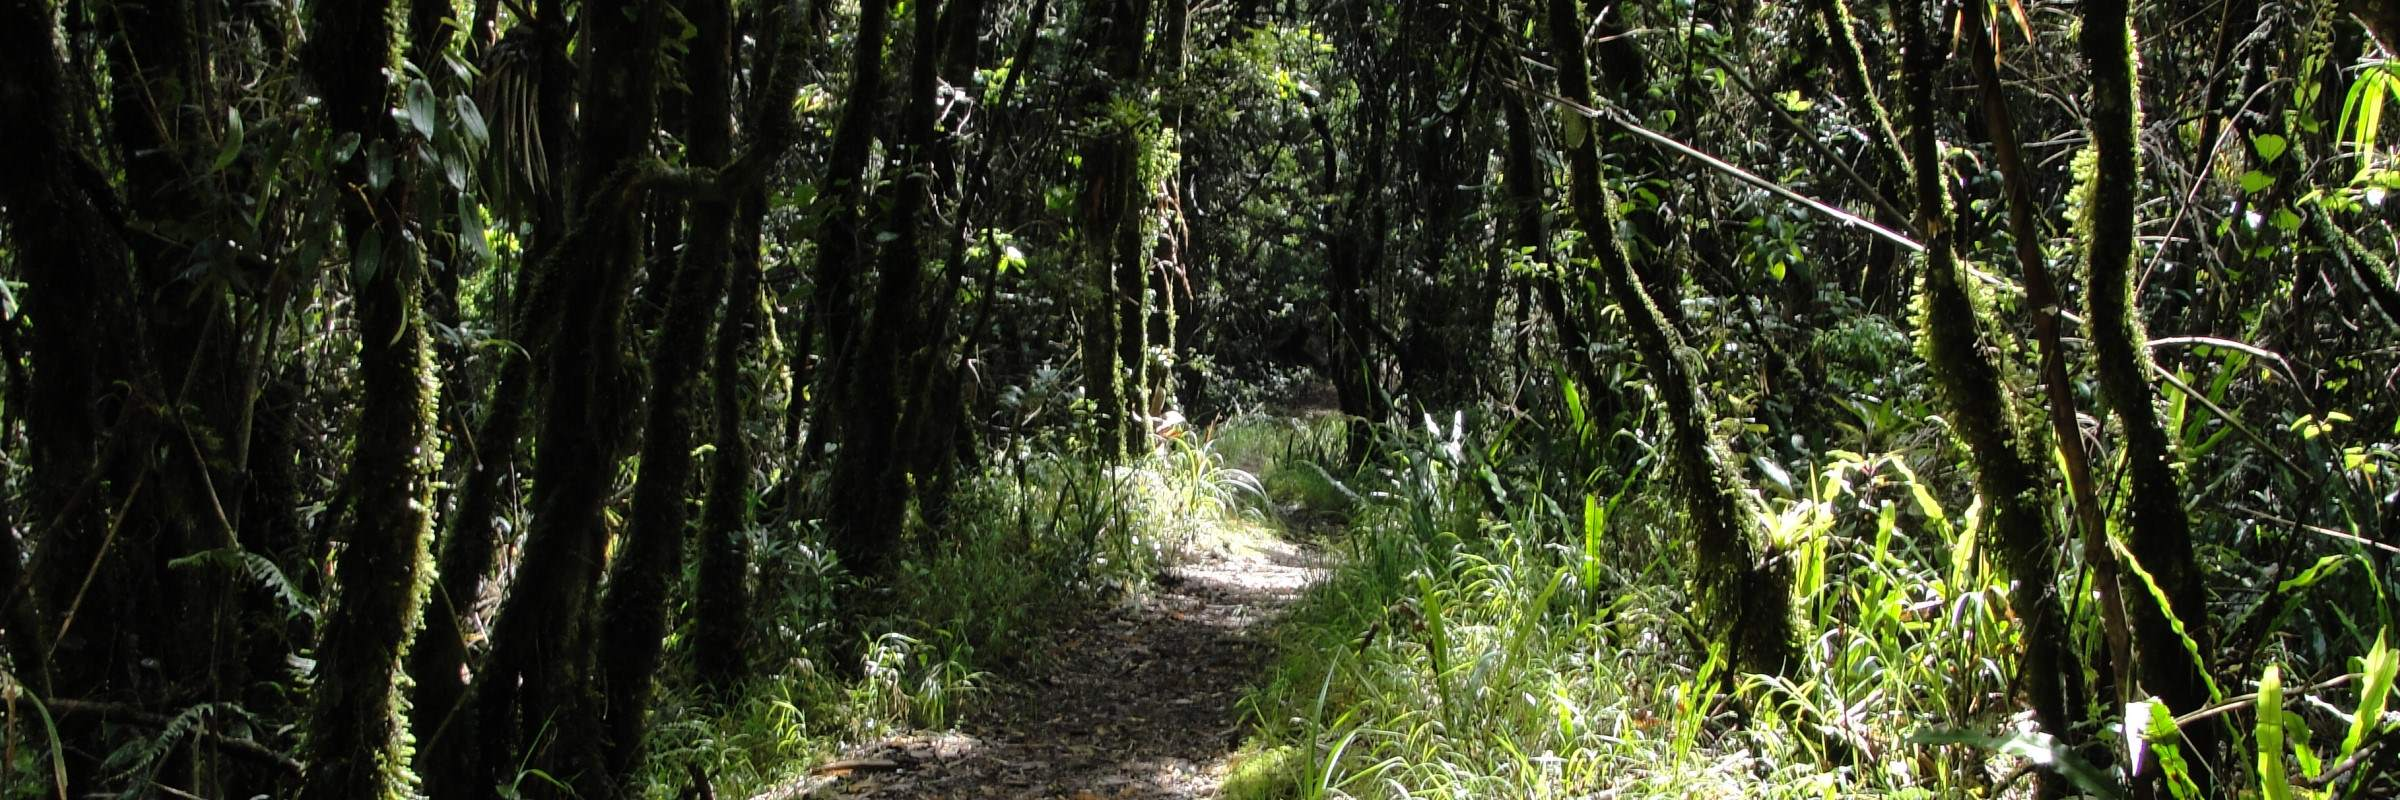 Refugio de Vida Silvestre Pasochoa